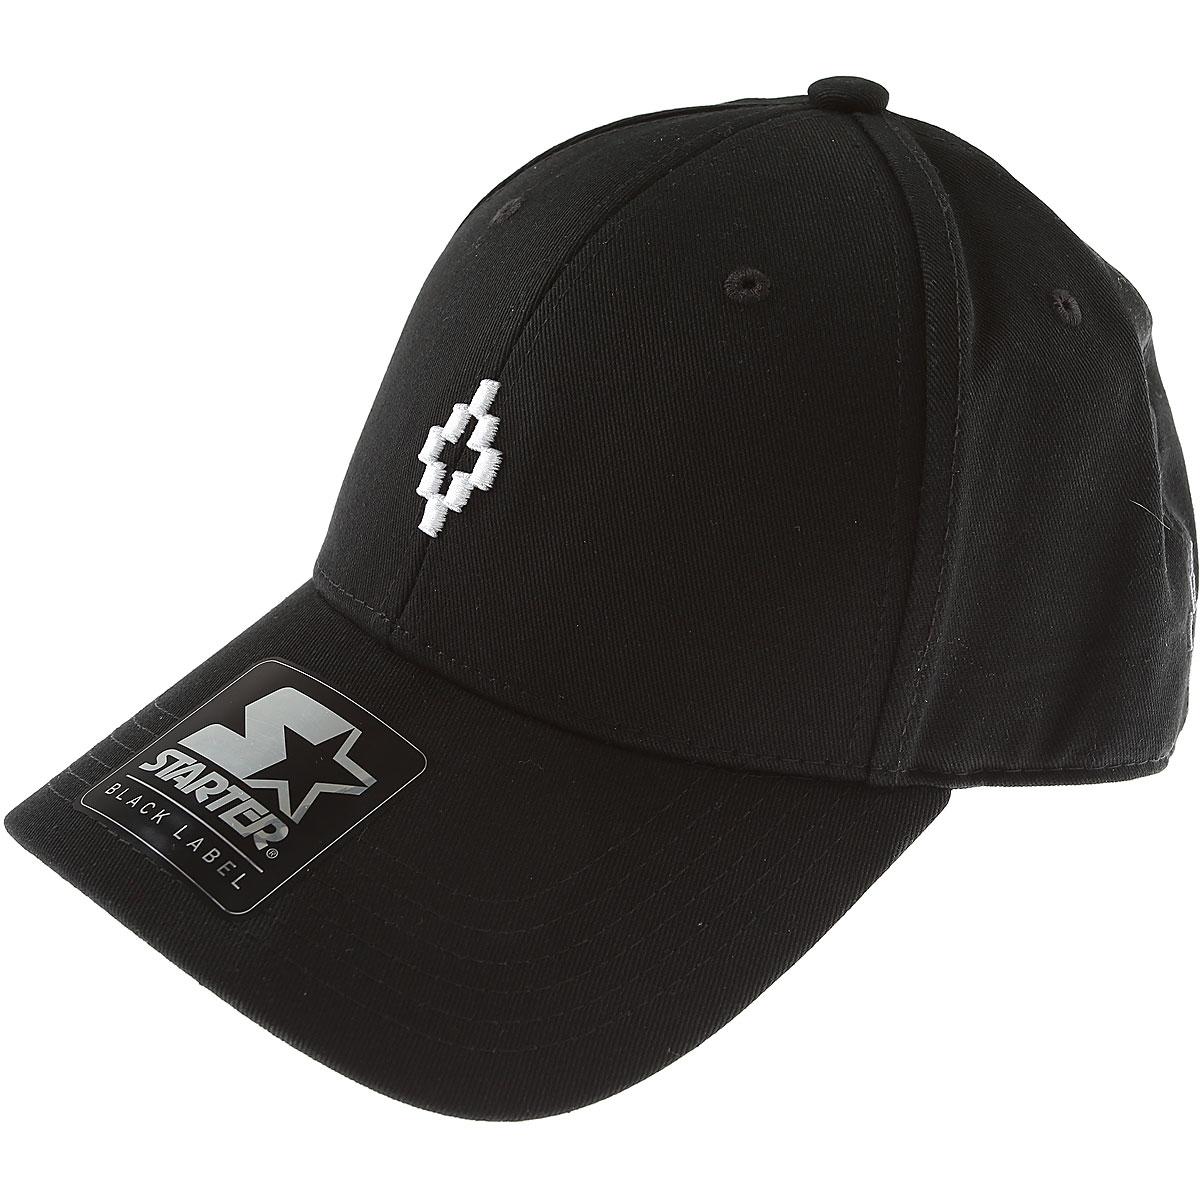 Marcelo Burlon Kids Hats for Boys On Sale in Outlet, Black, Cotton, 2019